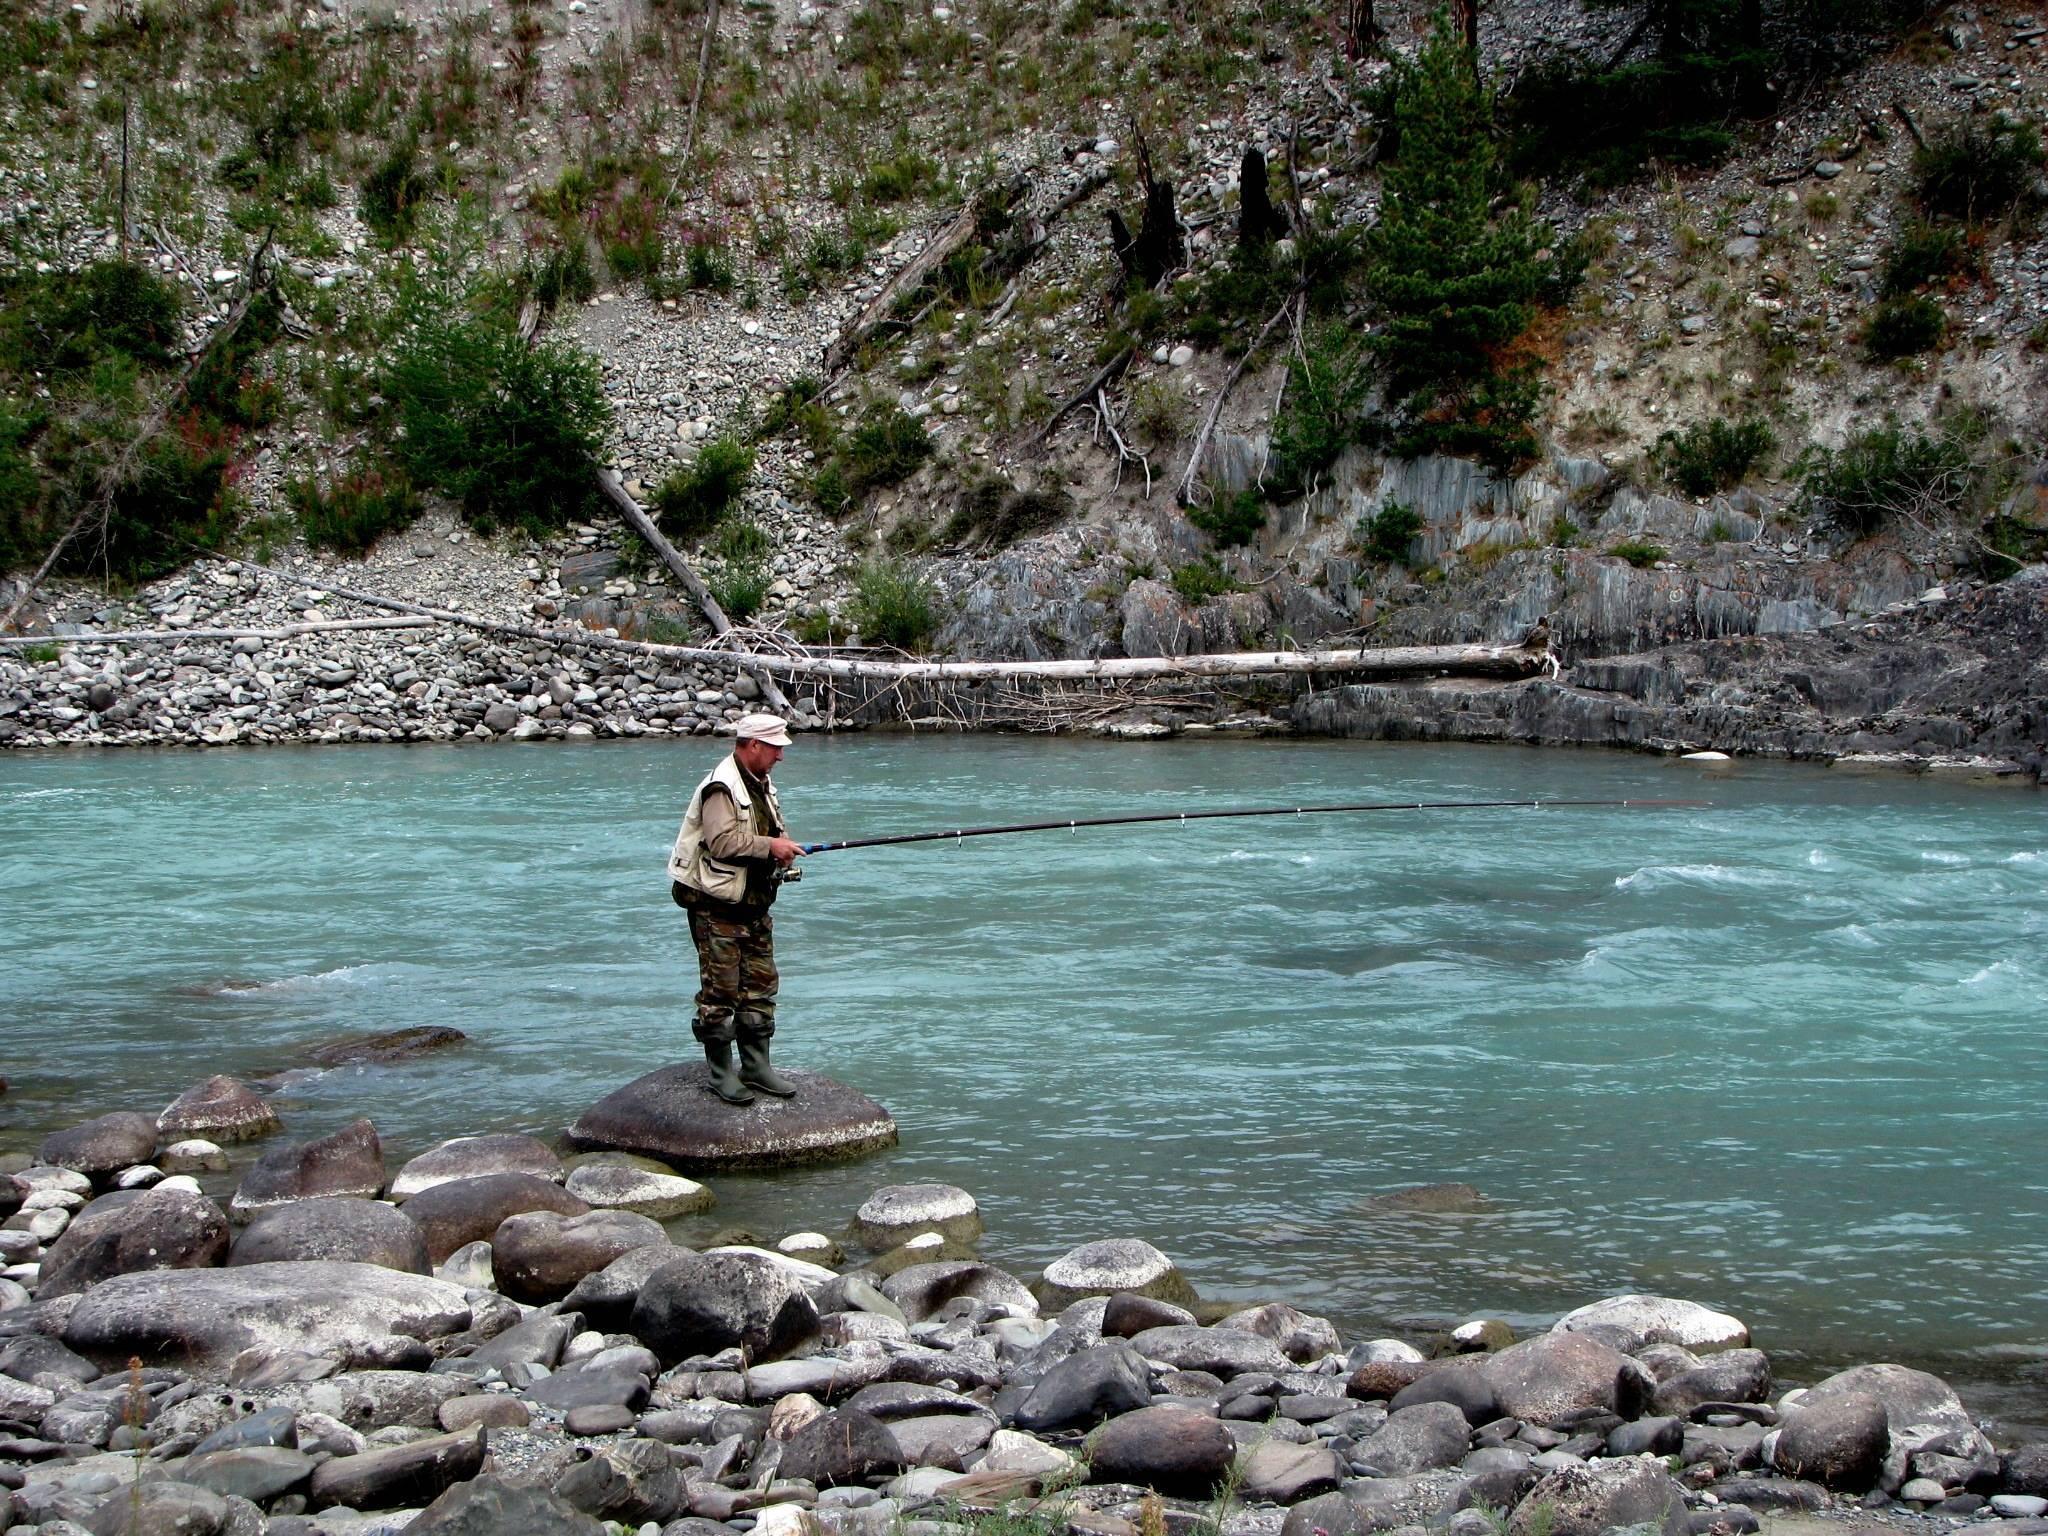 Рыбалка в море абхазия - про рыбалку